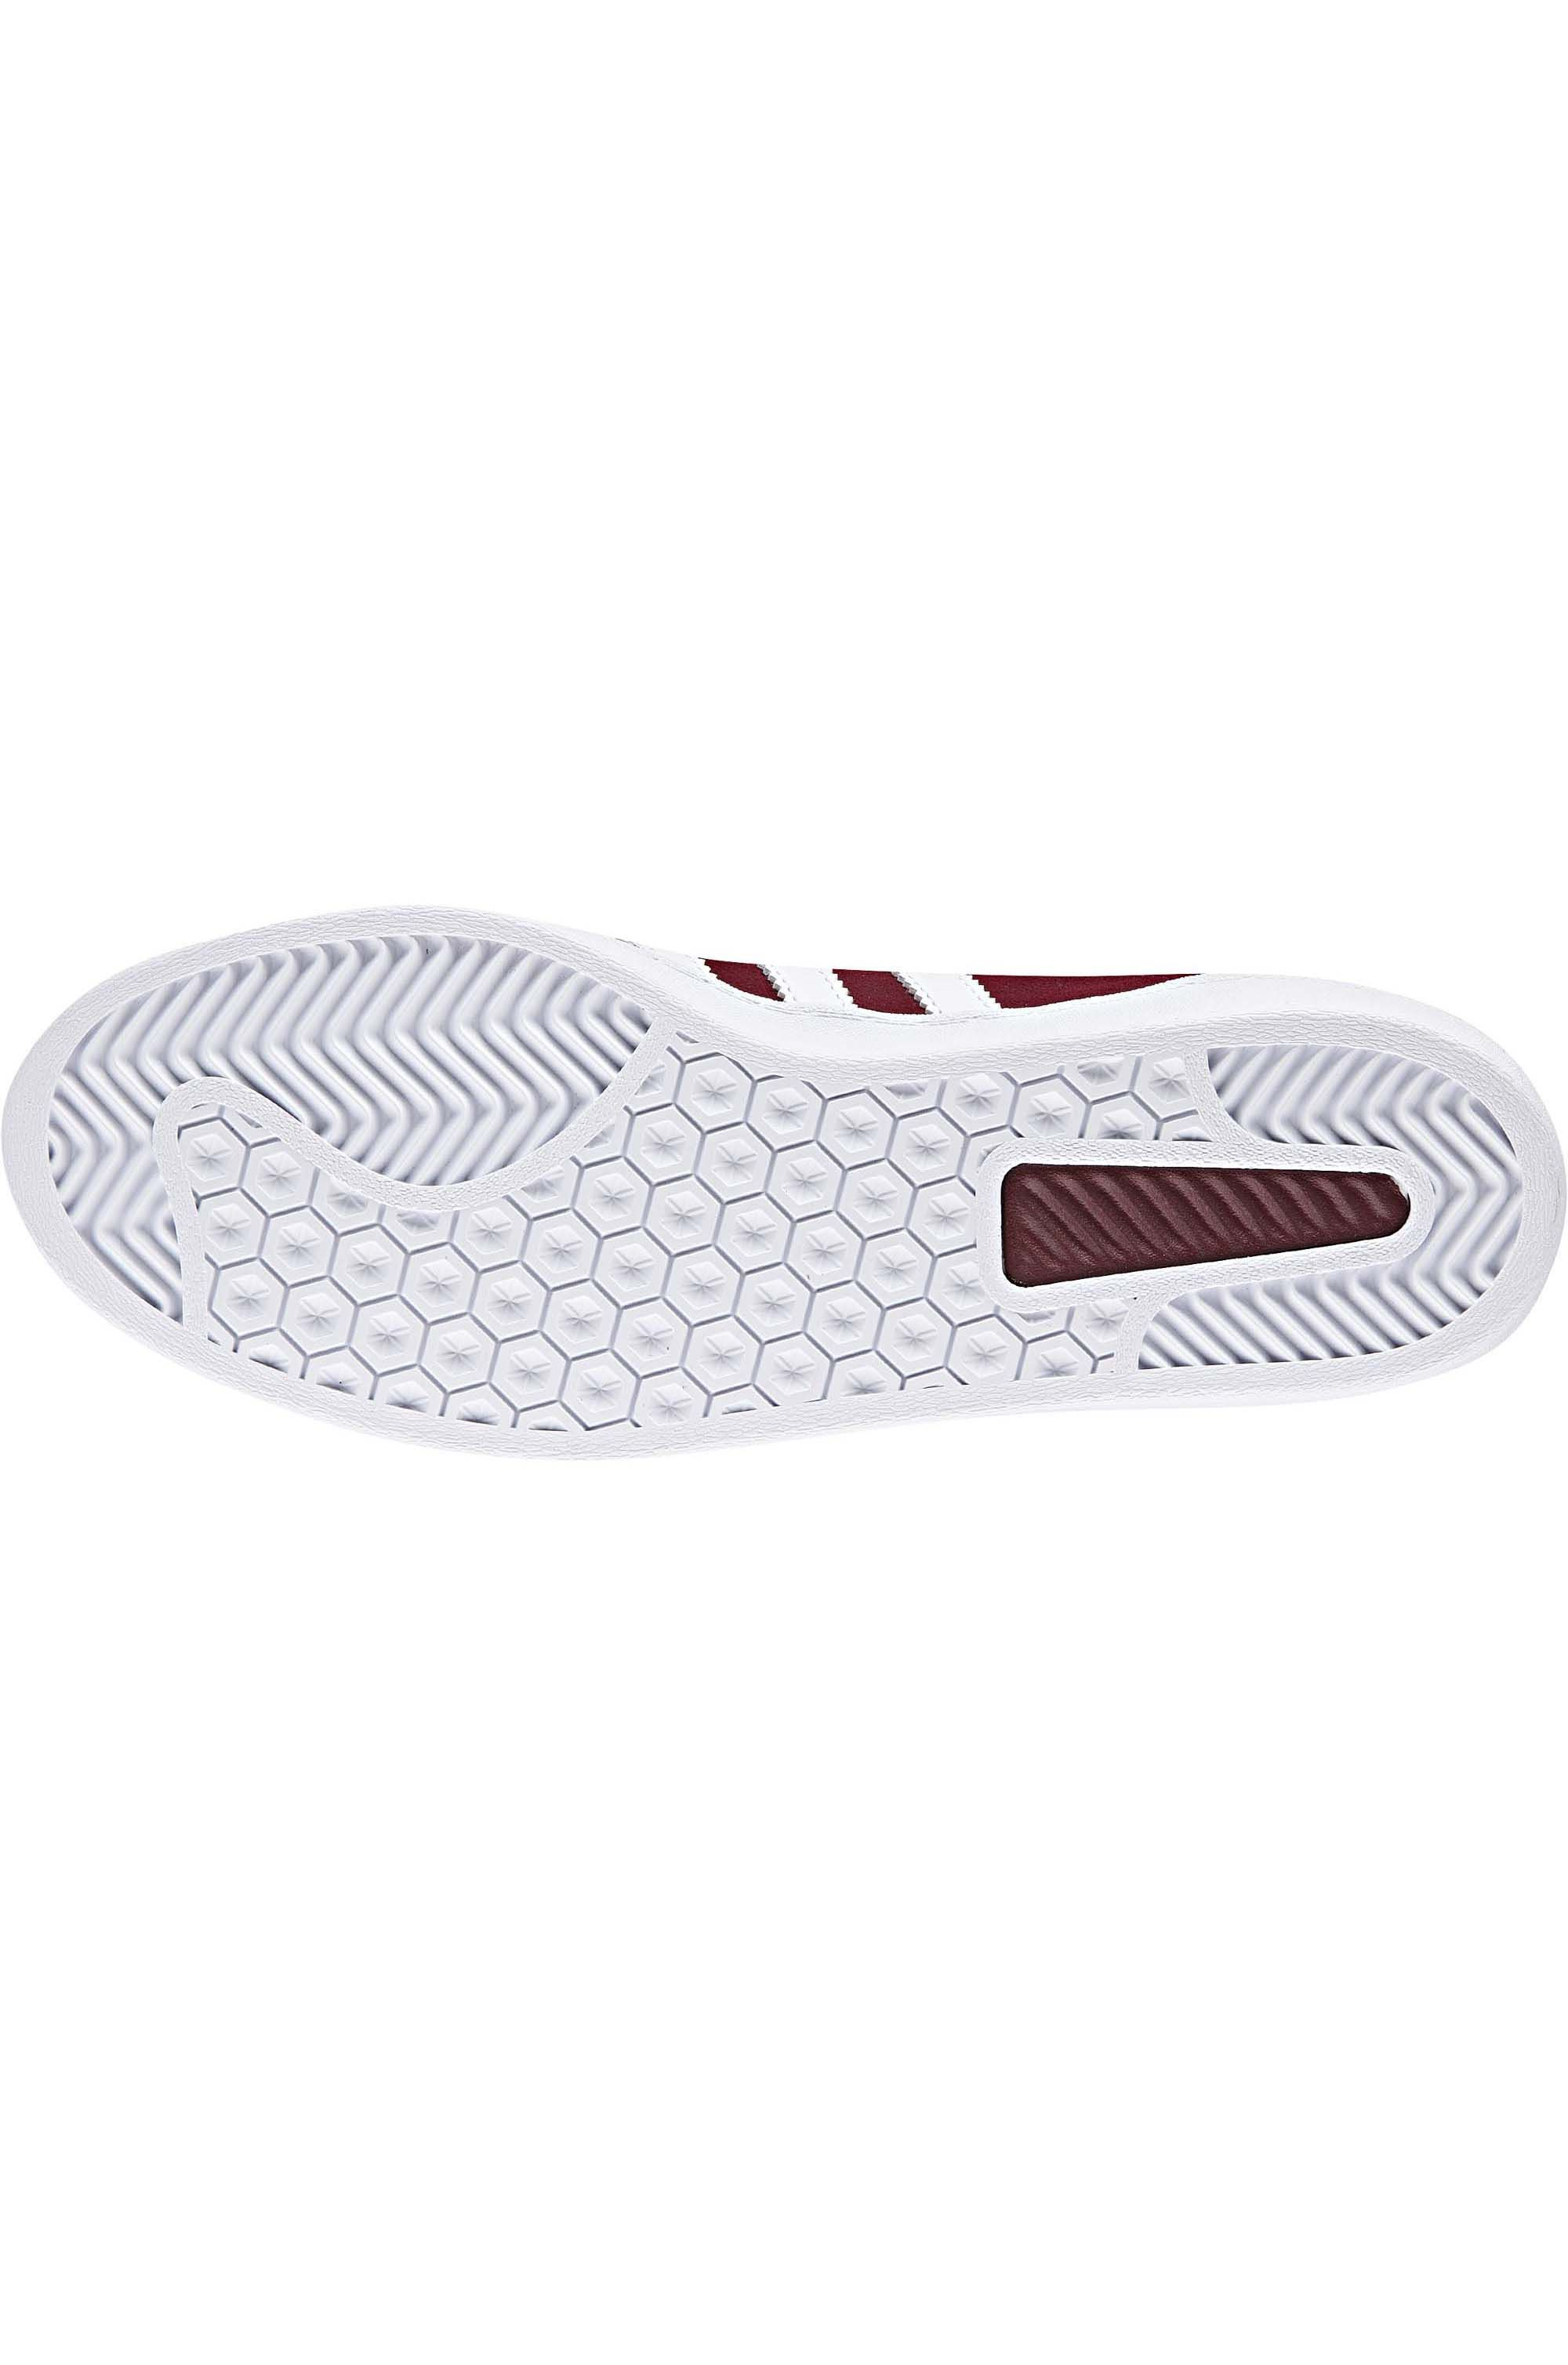 c5323ba3b ... Adidas Shoes CAMPUS ADV Collegiate Burgundy/Ftwr White/Ftwr White